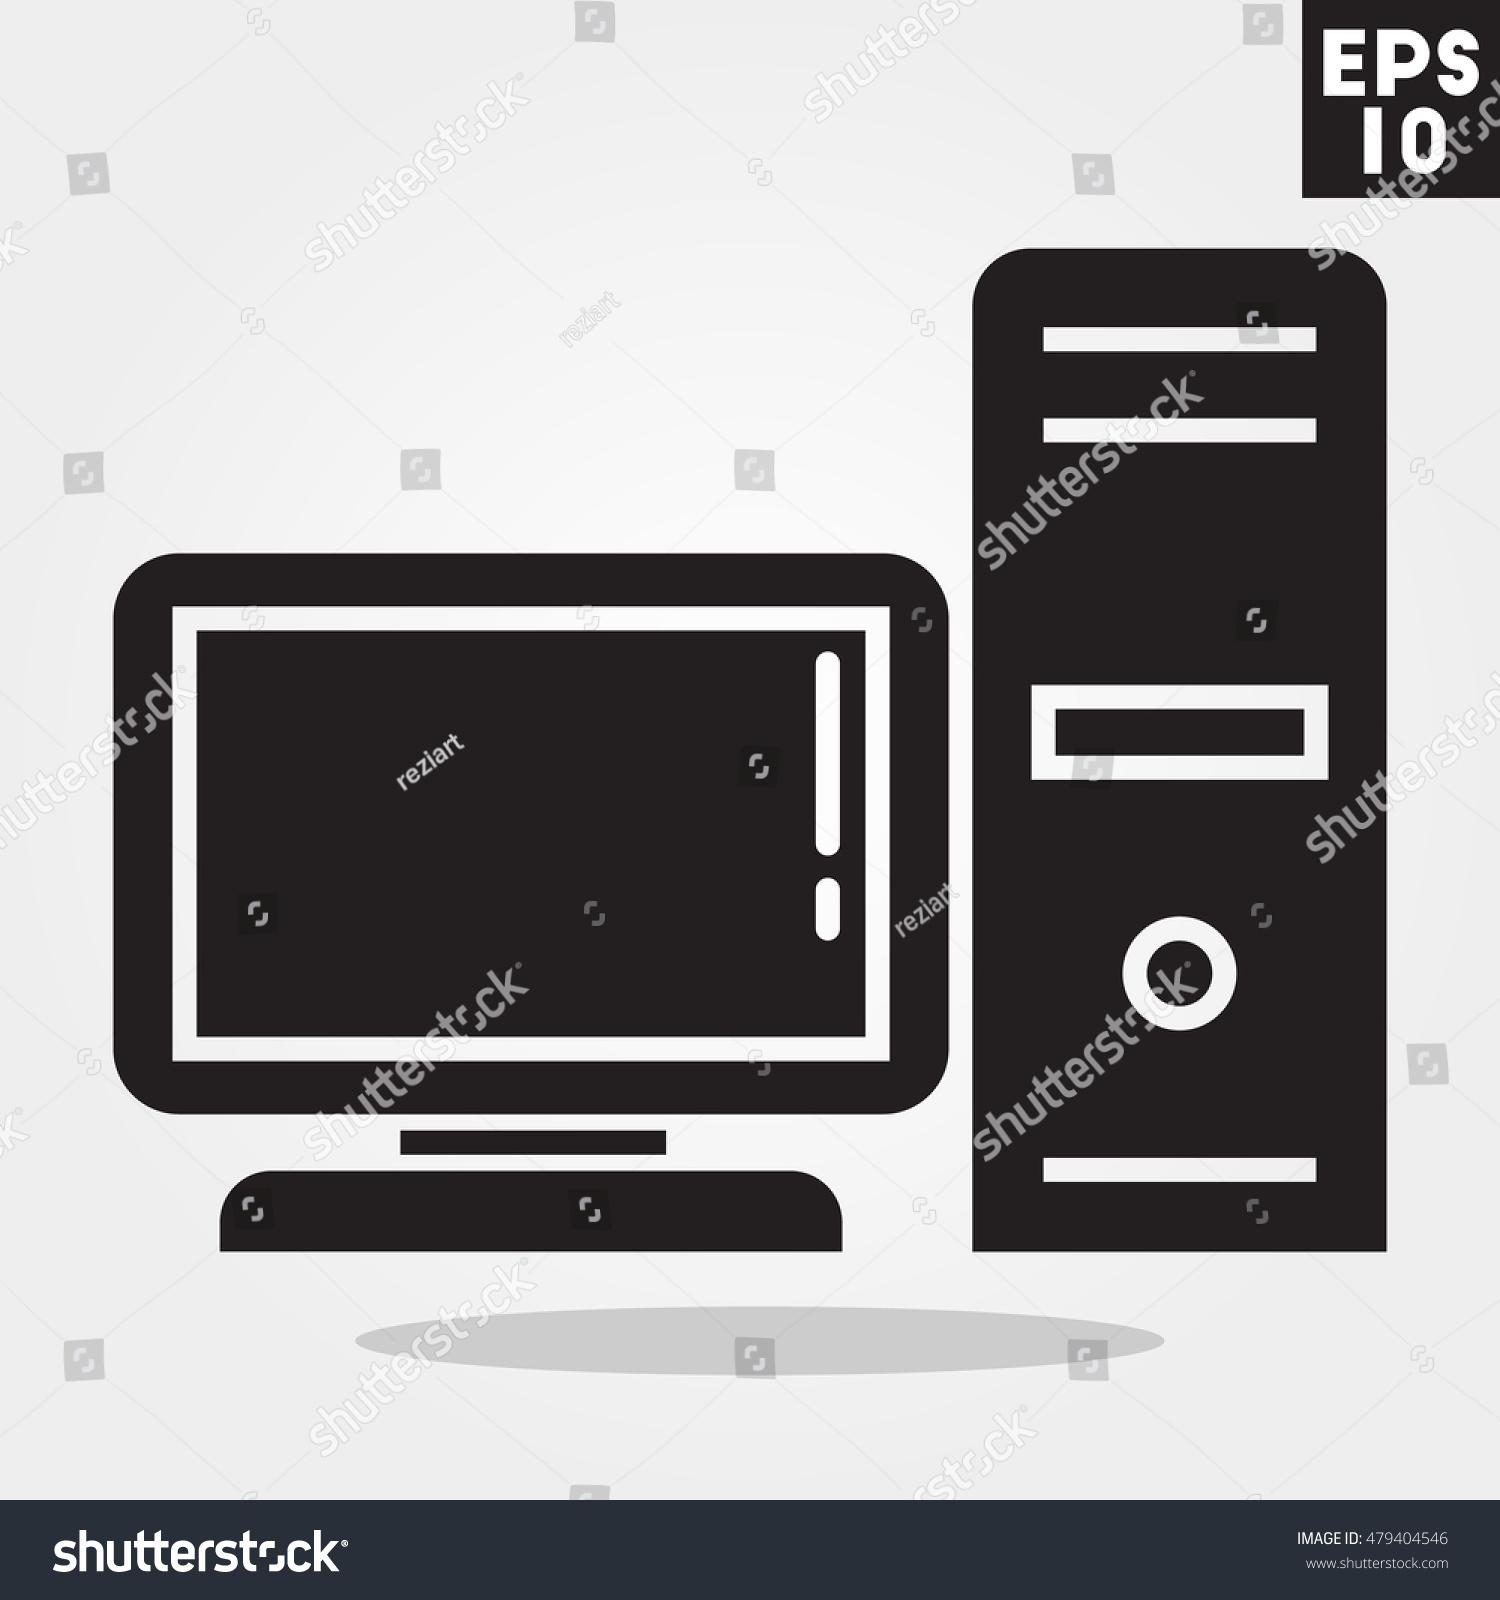 Computer Desktop Icon Trendy Flat Style Stock Vector 479404546